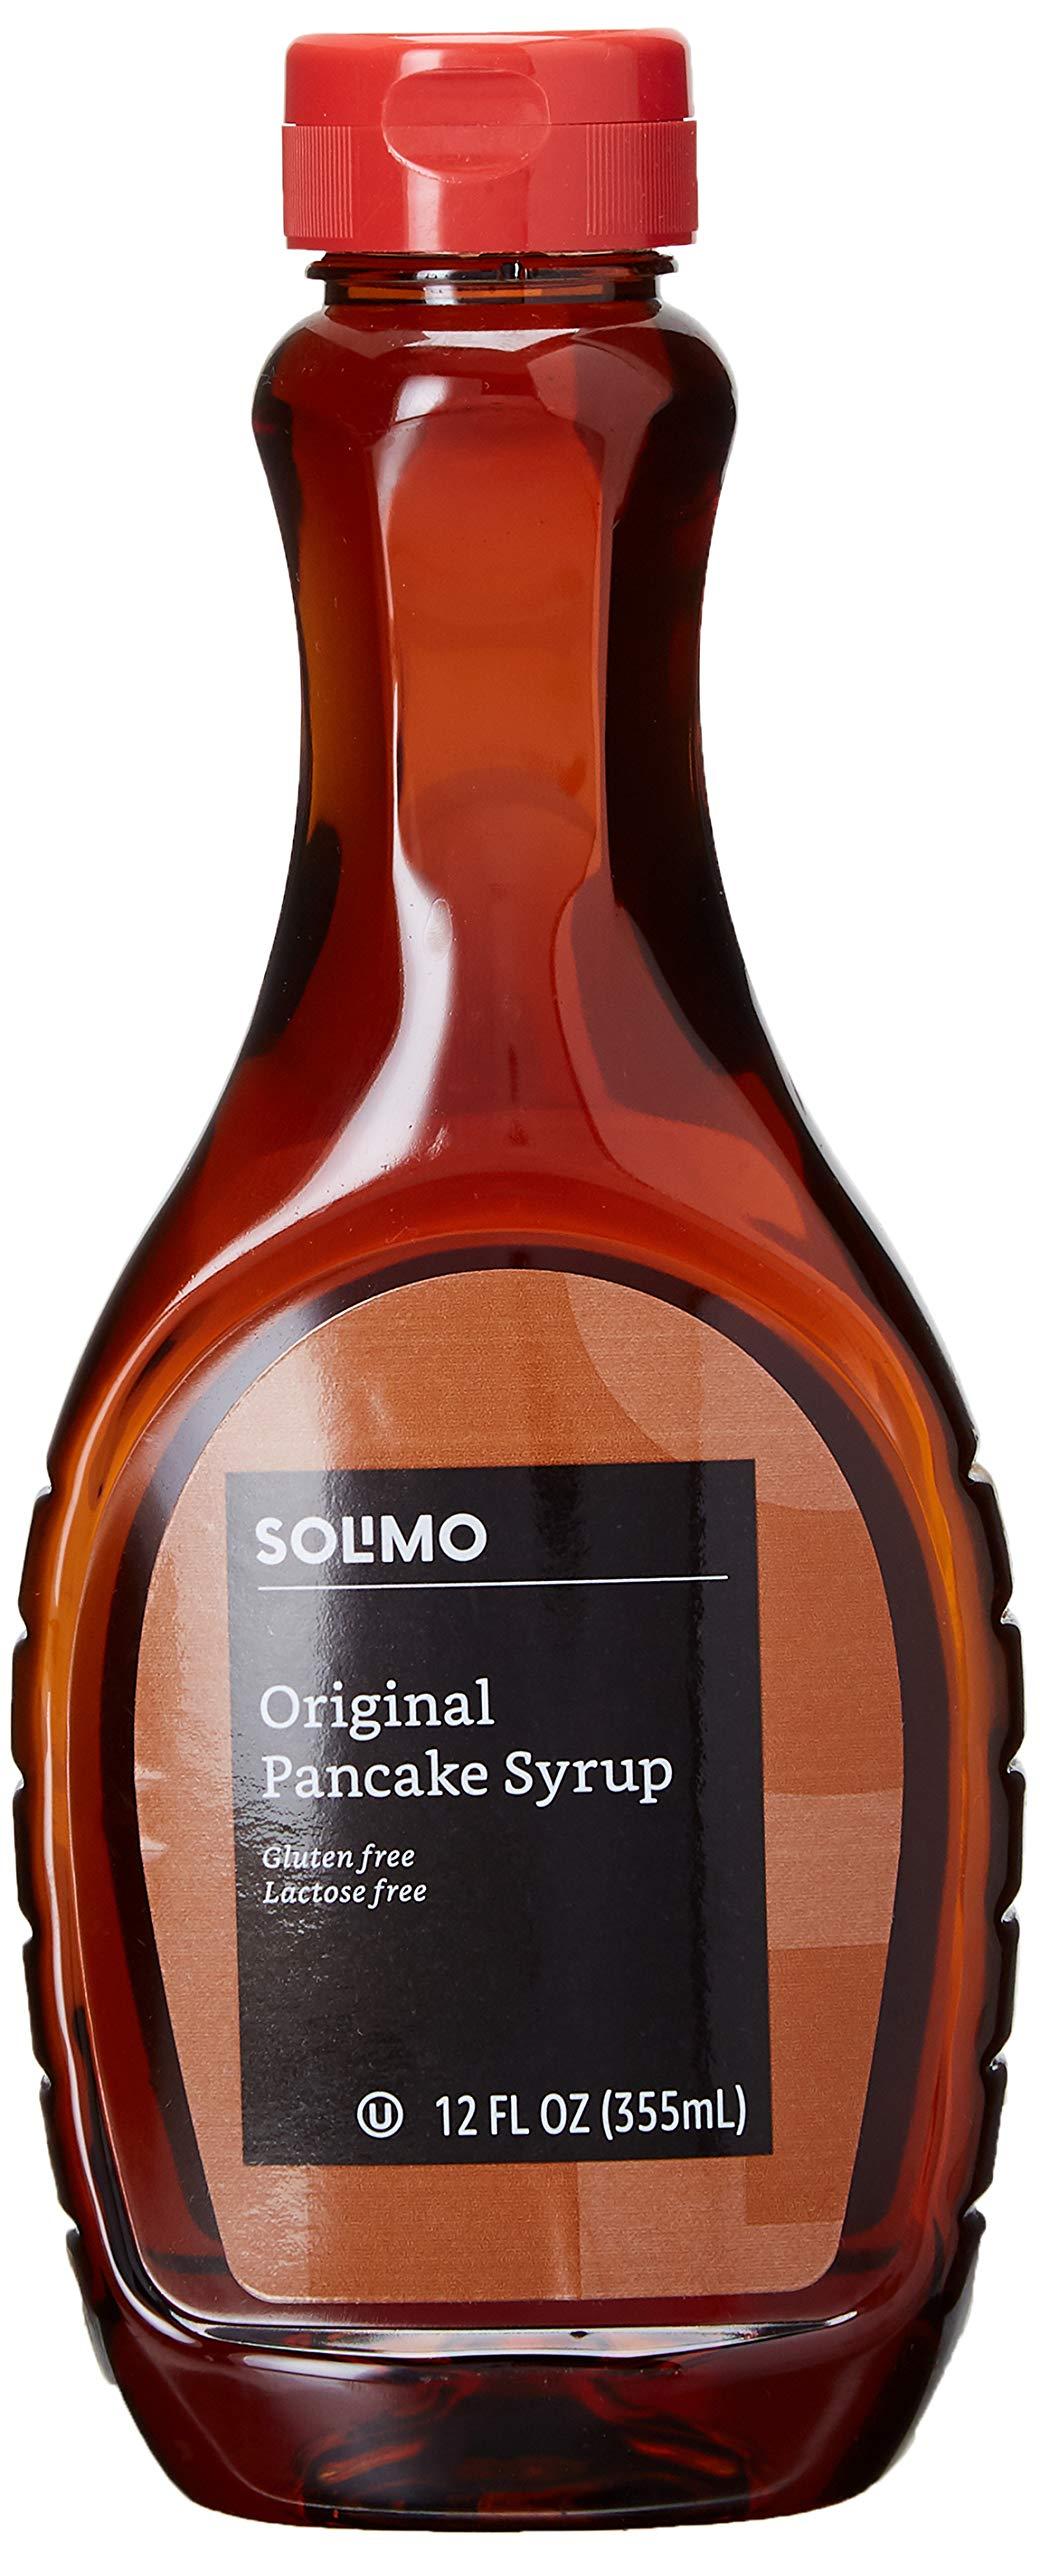 Amazon Brand - Solimo Pancake Syrup, Original Flavor, 12 ounces